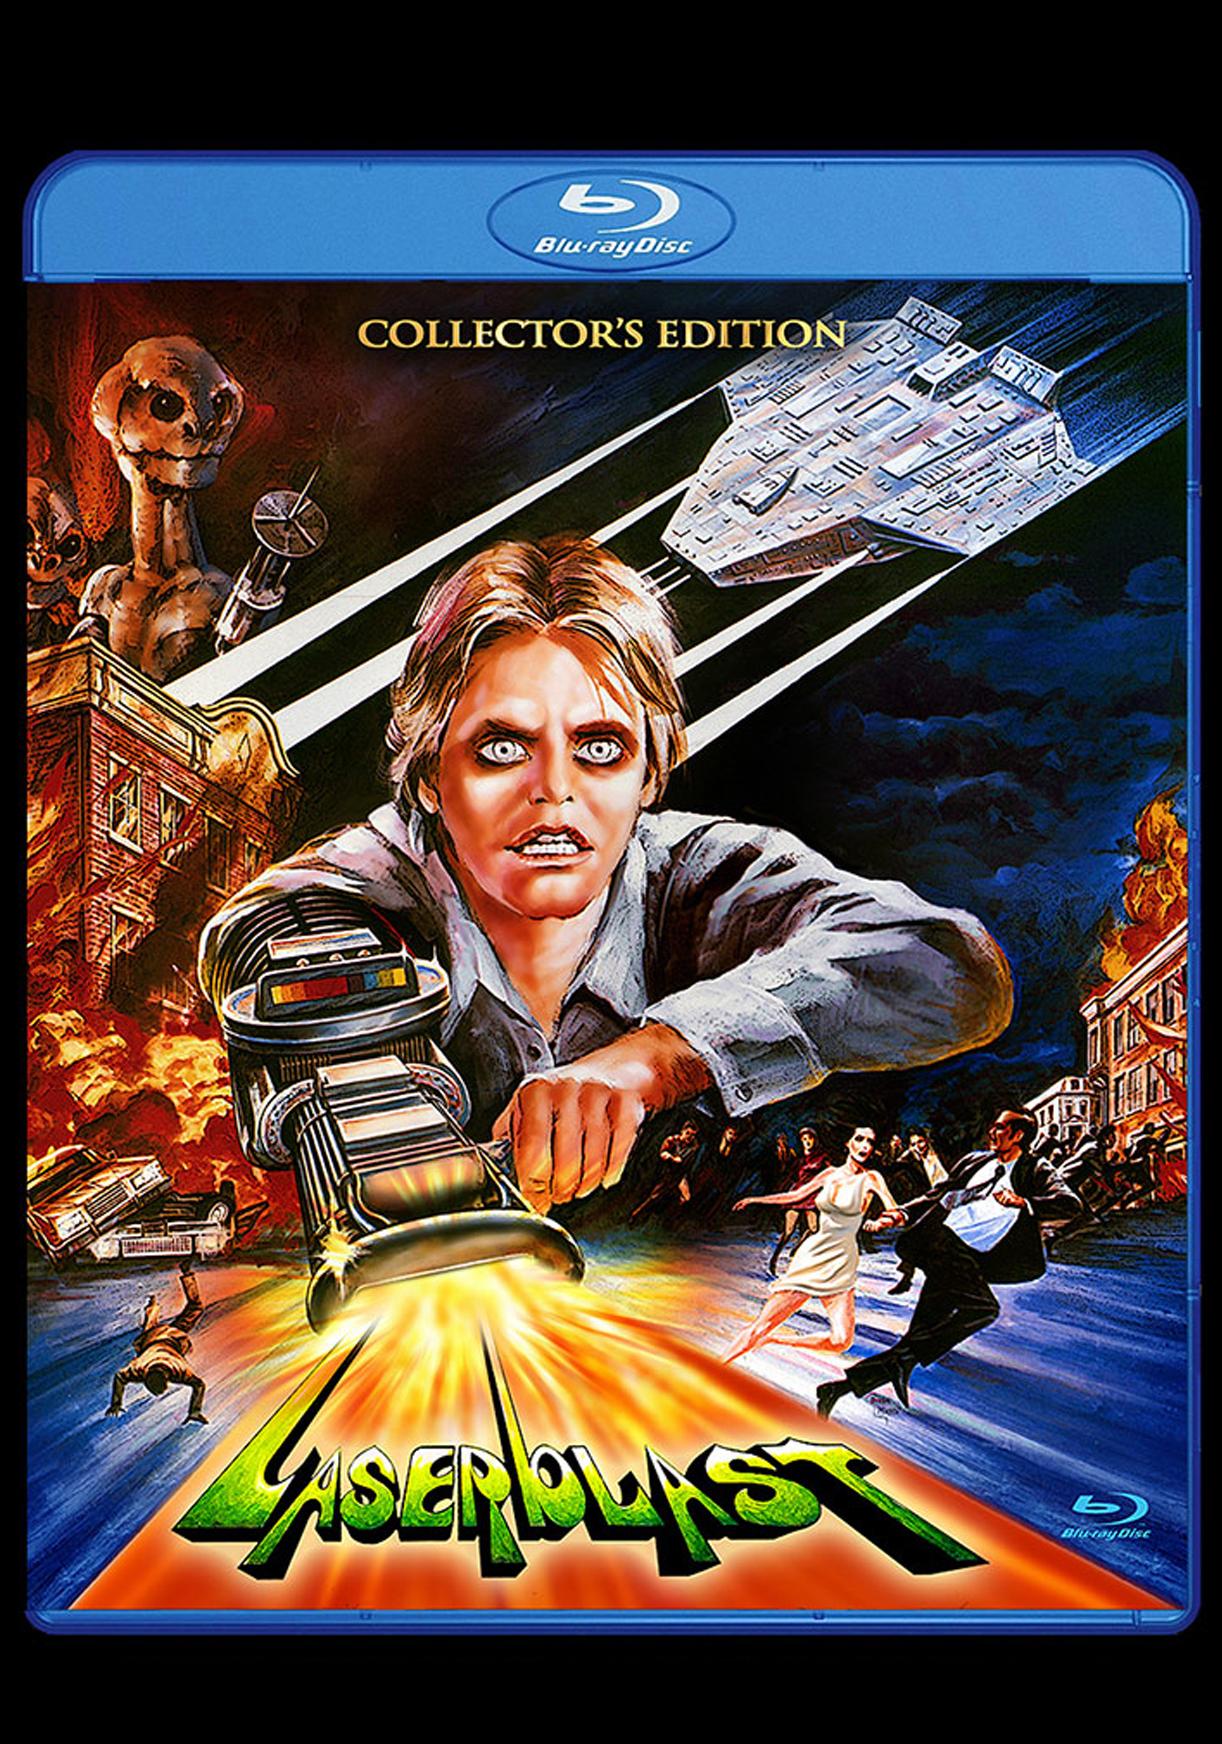 Laserblast   Blu-Ray  $24.95